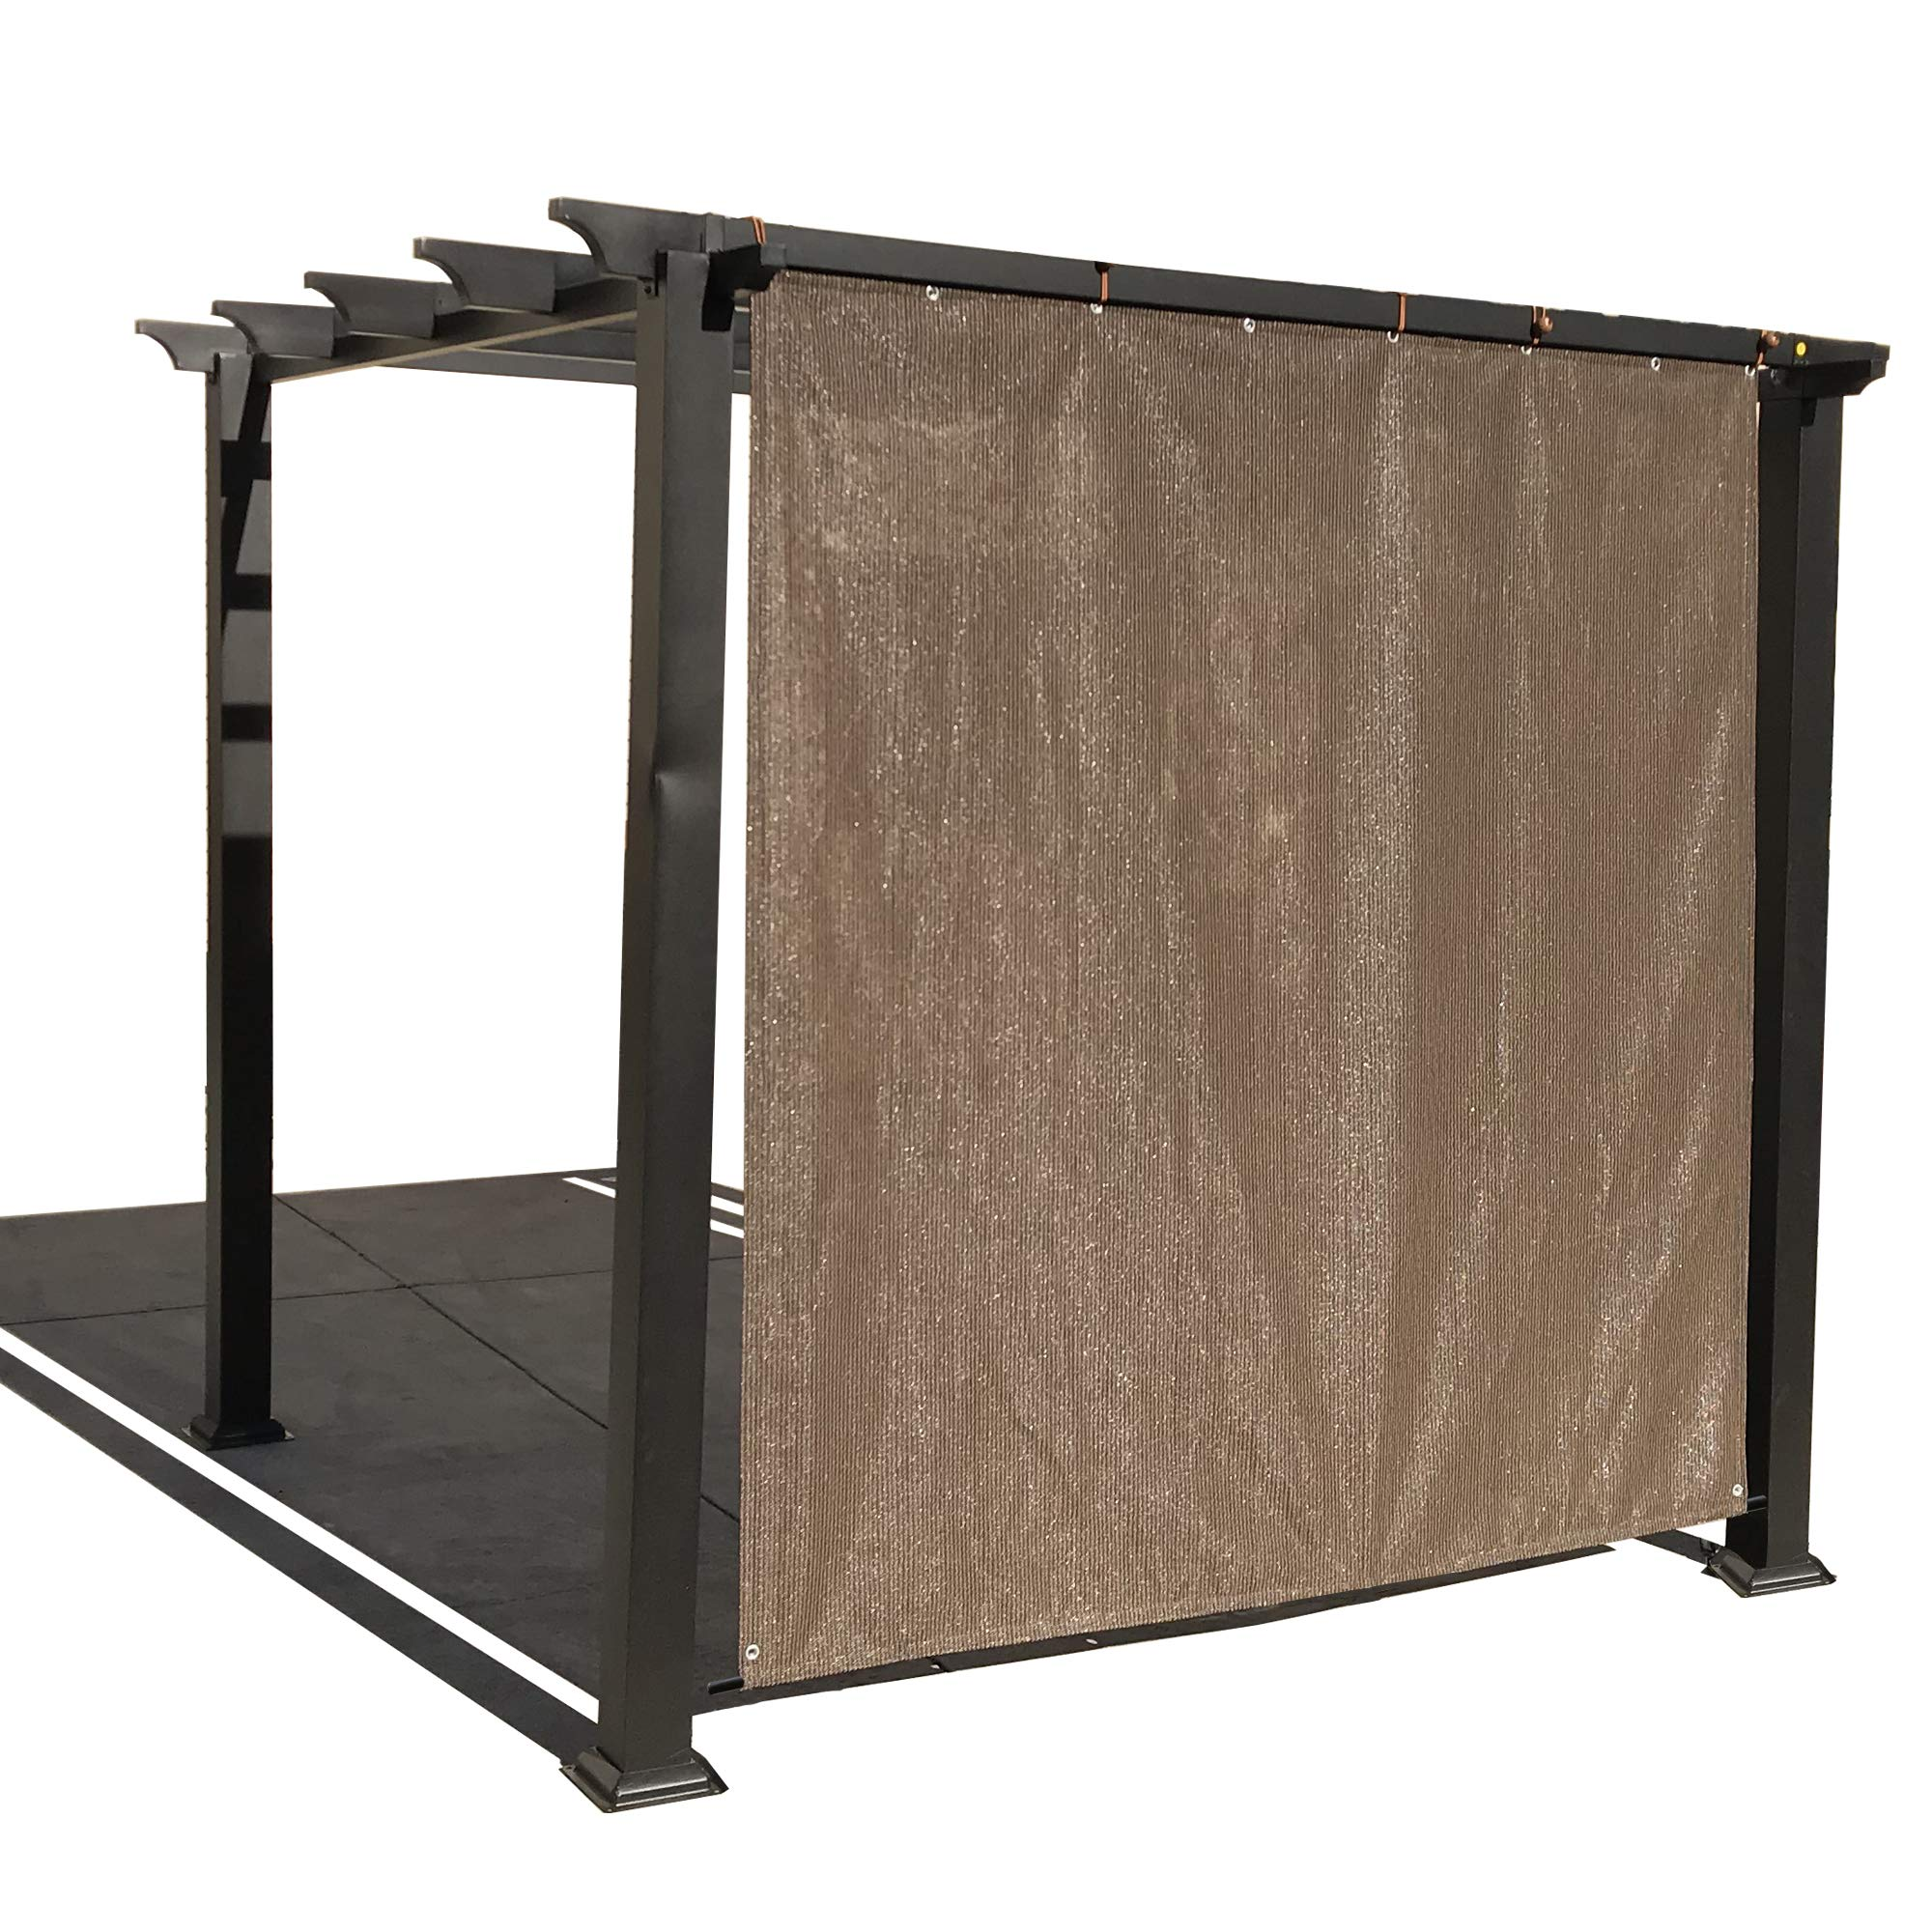 Alion casa Rod bolsillo parasol Panel con ojales de aluminio para Patio toldo, toldo, cubierta de ventana, Instant Pared lateral, pérgola o RV: Amazon.es: Jardín